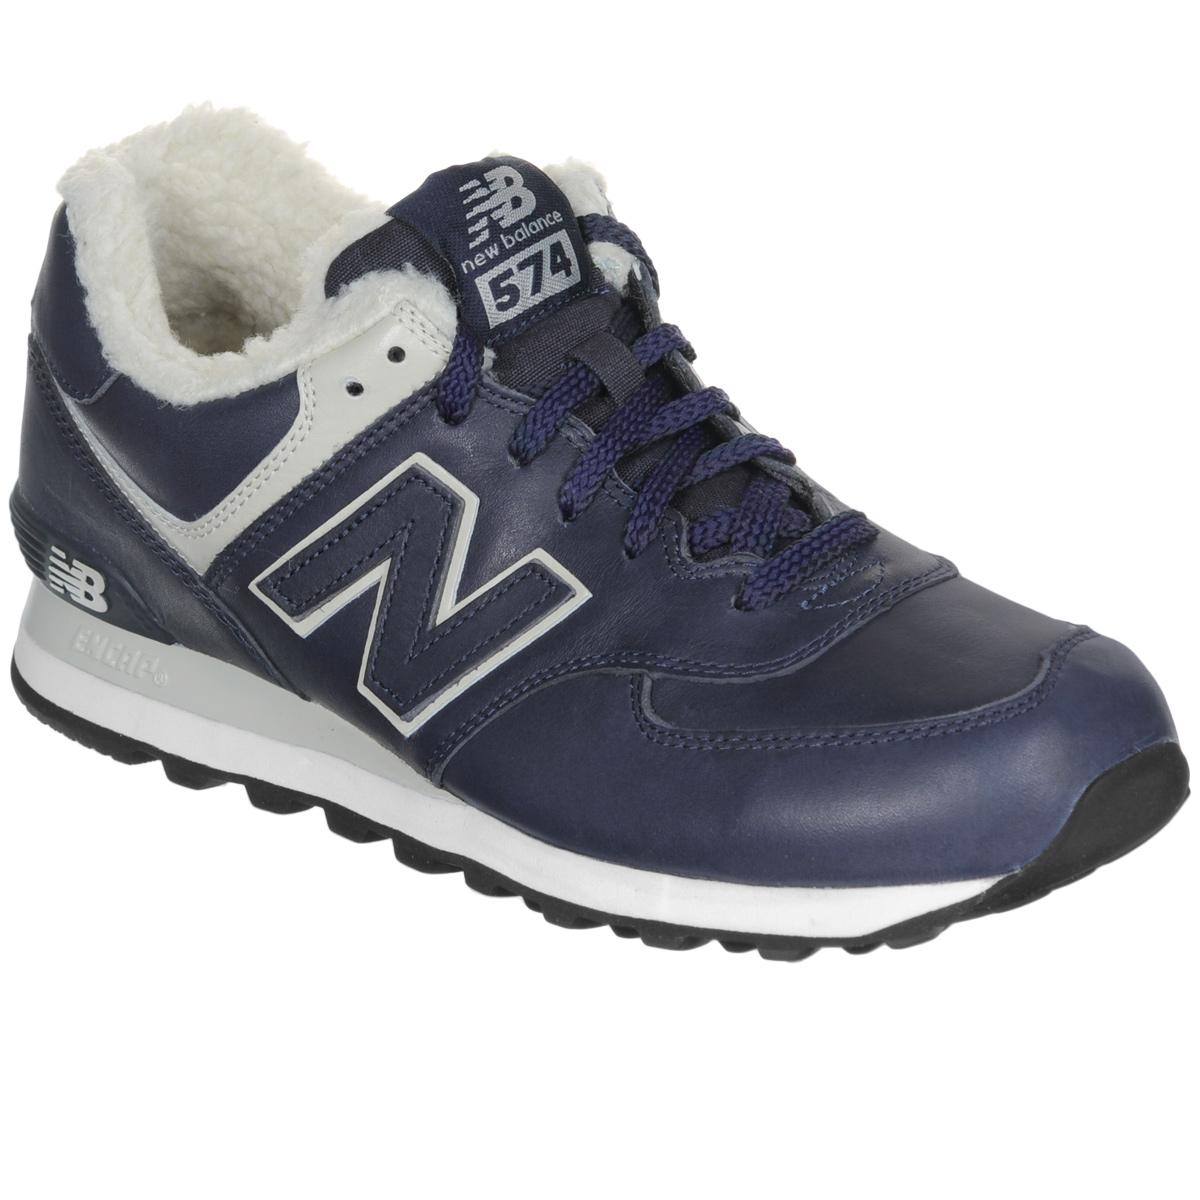 New Balance ��������� ������� 574. ML574NV/D